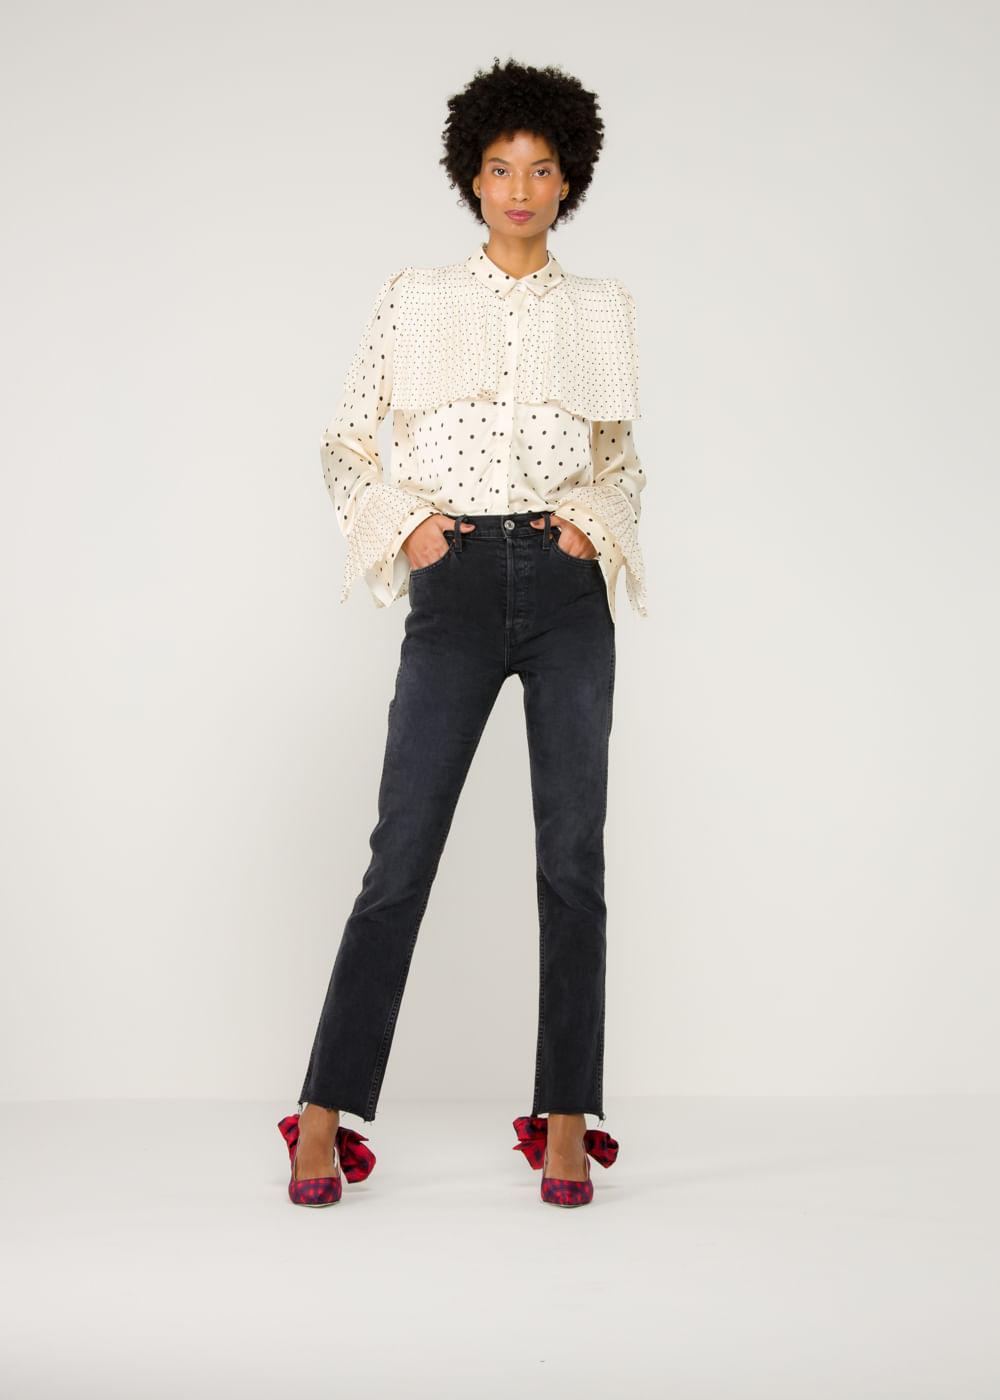 Calça Jeans Double Needle Long Preta Preta 28 Us